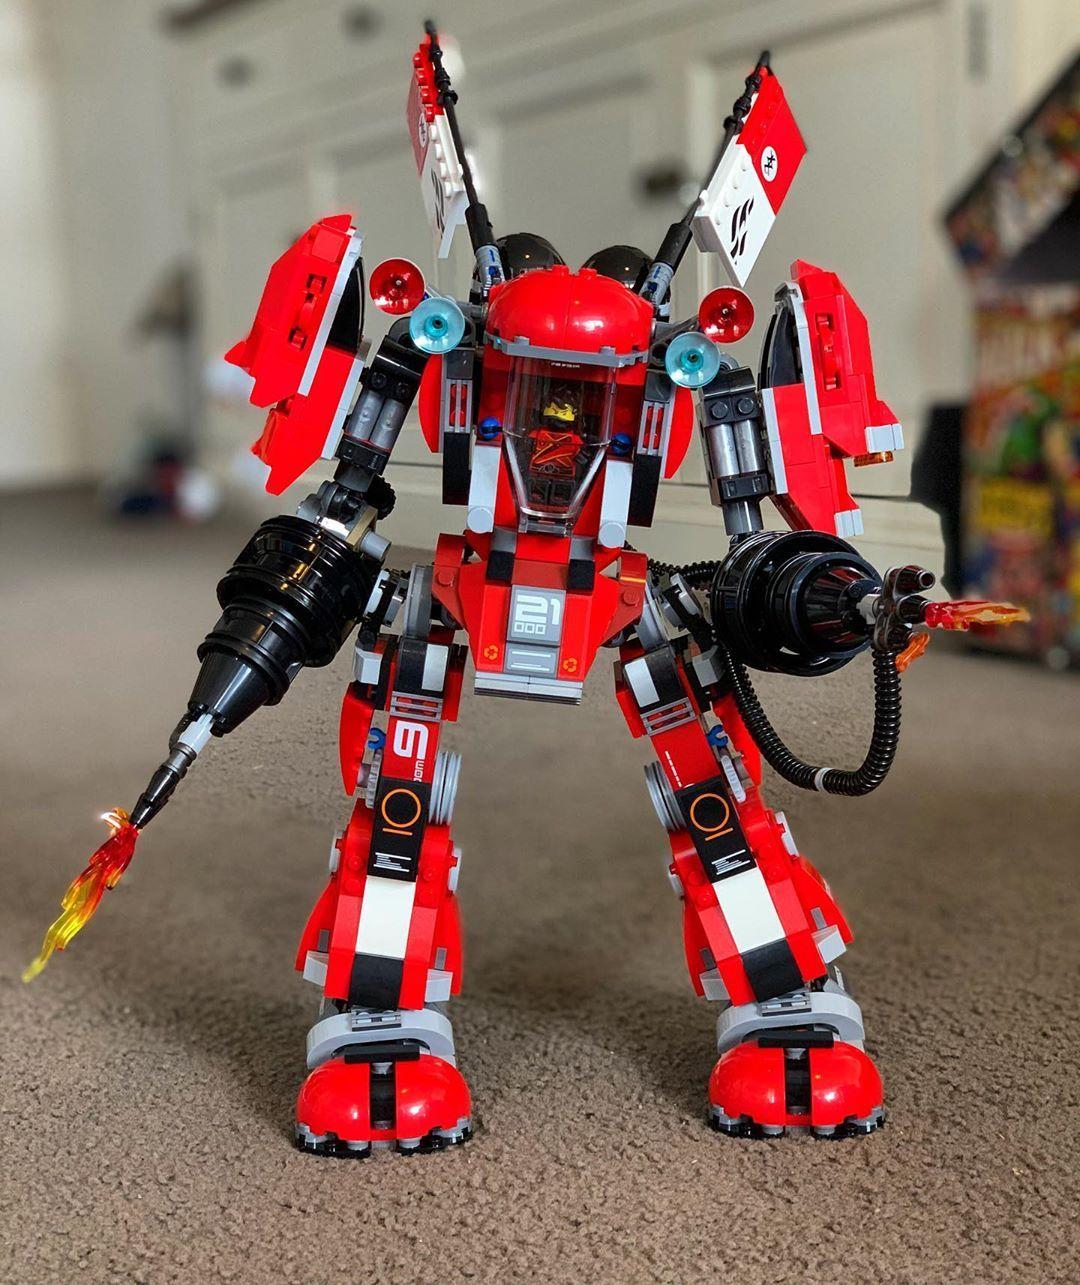 Fire Mech Built Lego Ninjago Ninjago Lego Lego Building Vehicles